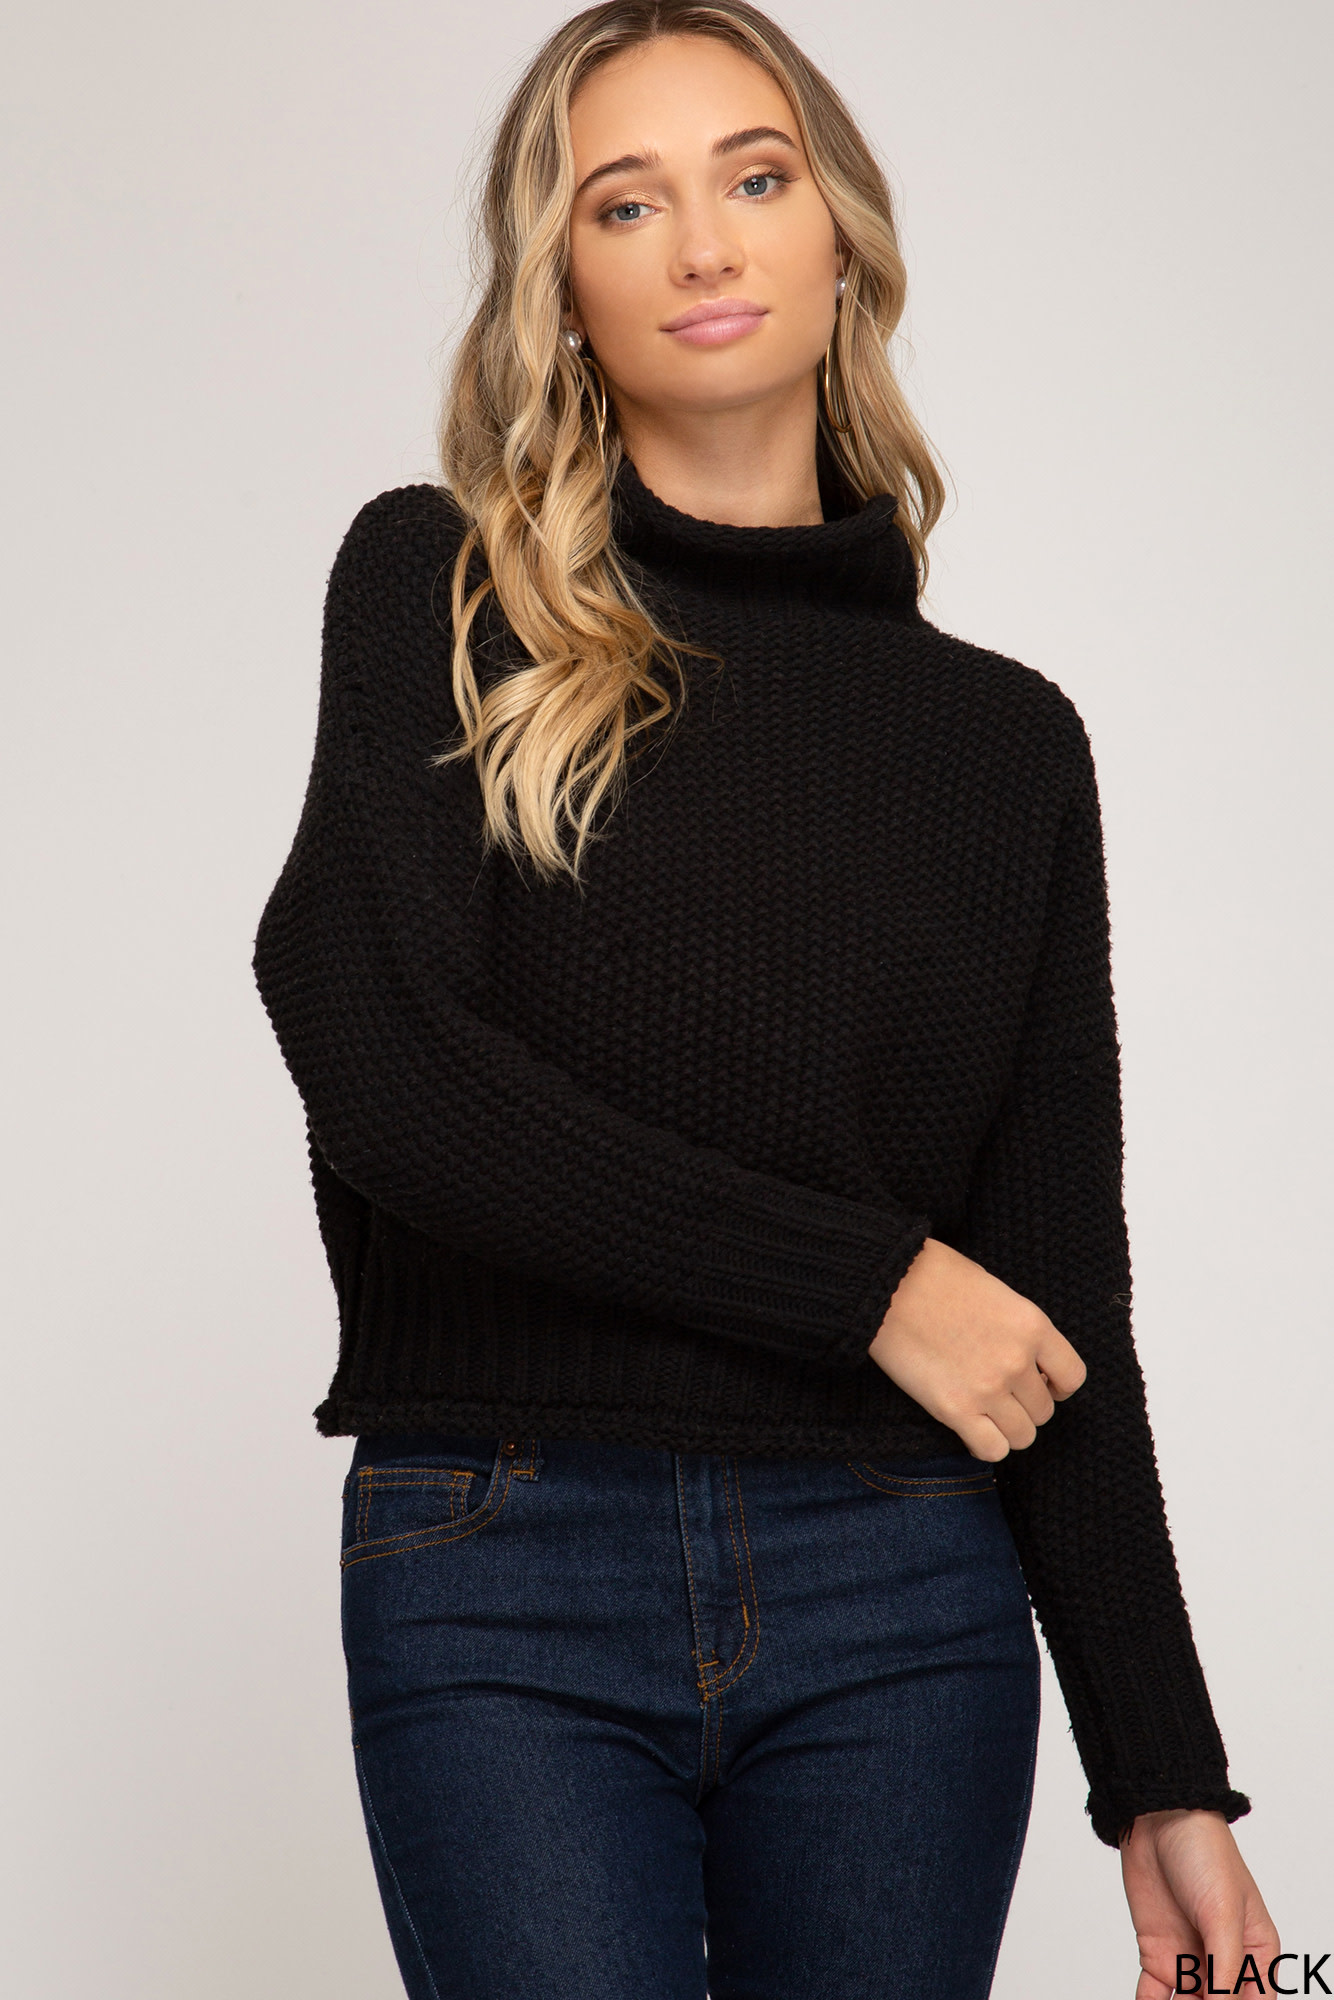 She + Sky L/S turtleneck sweater